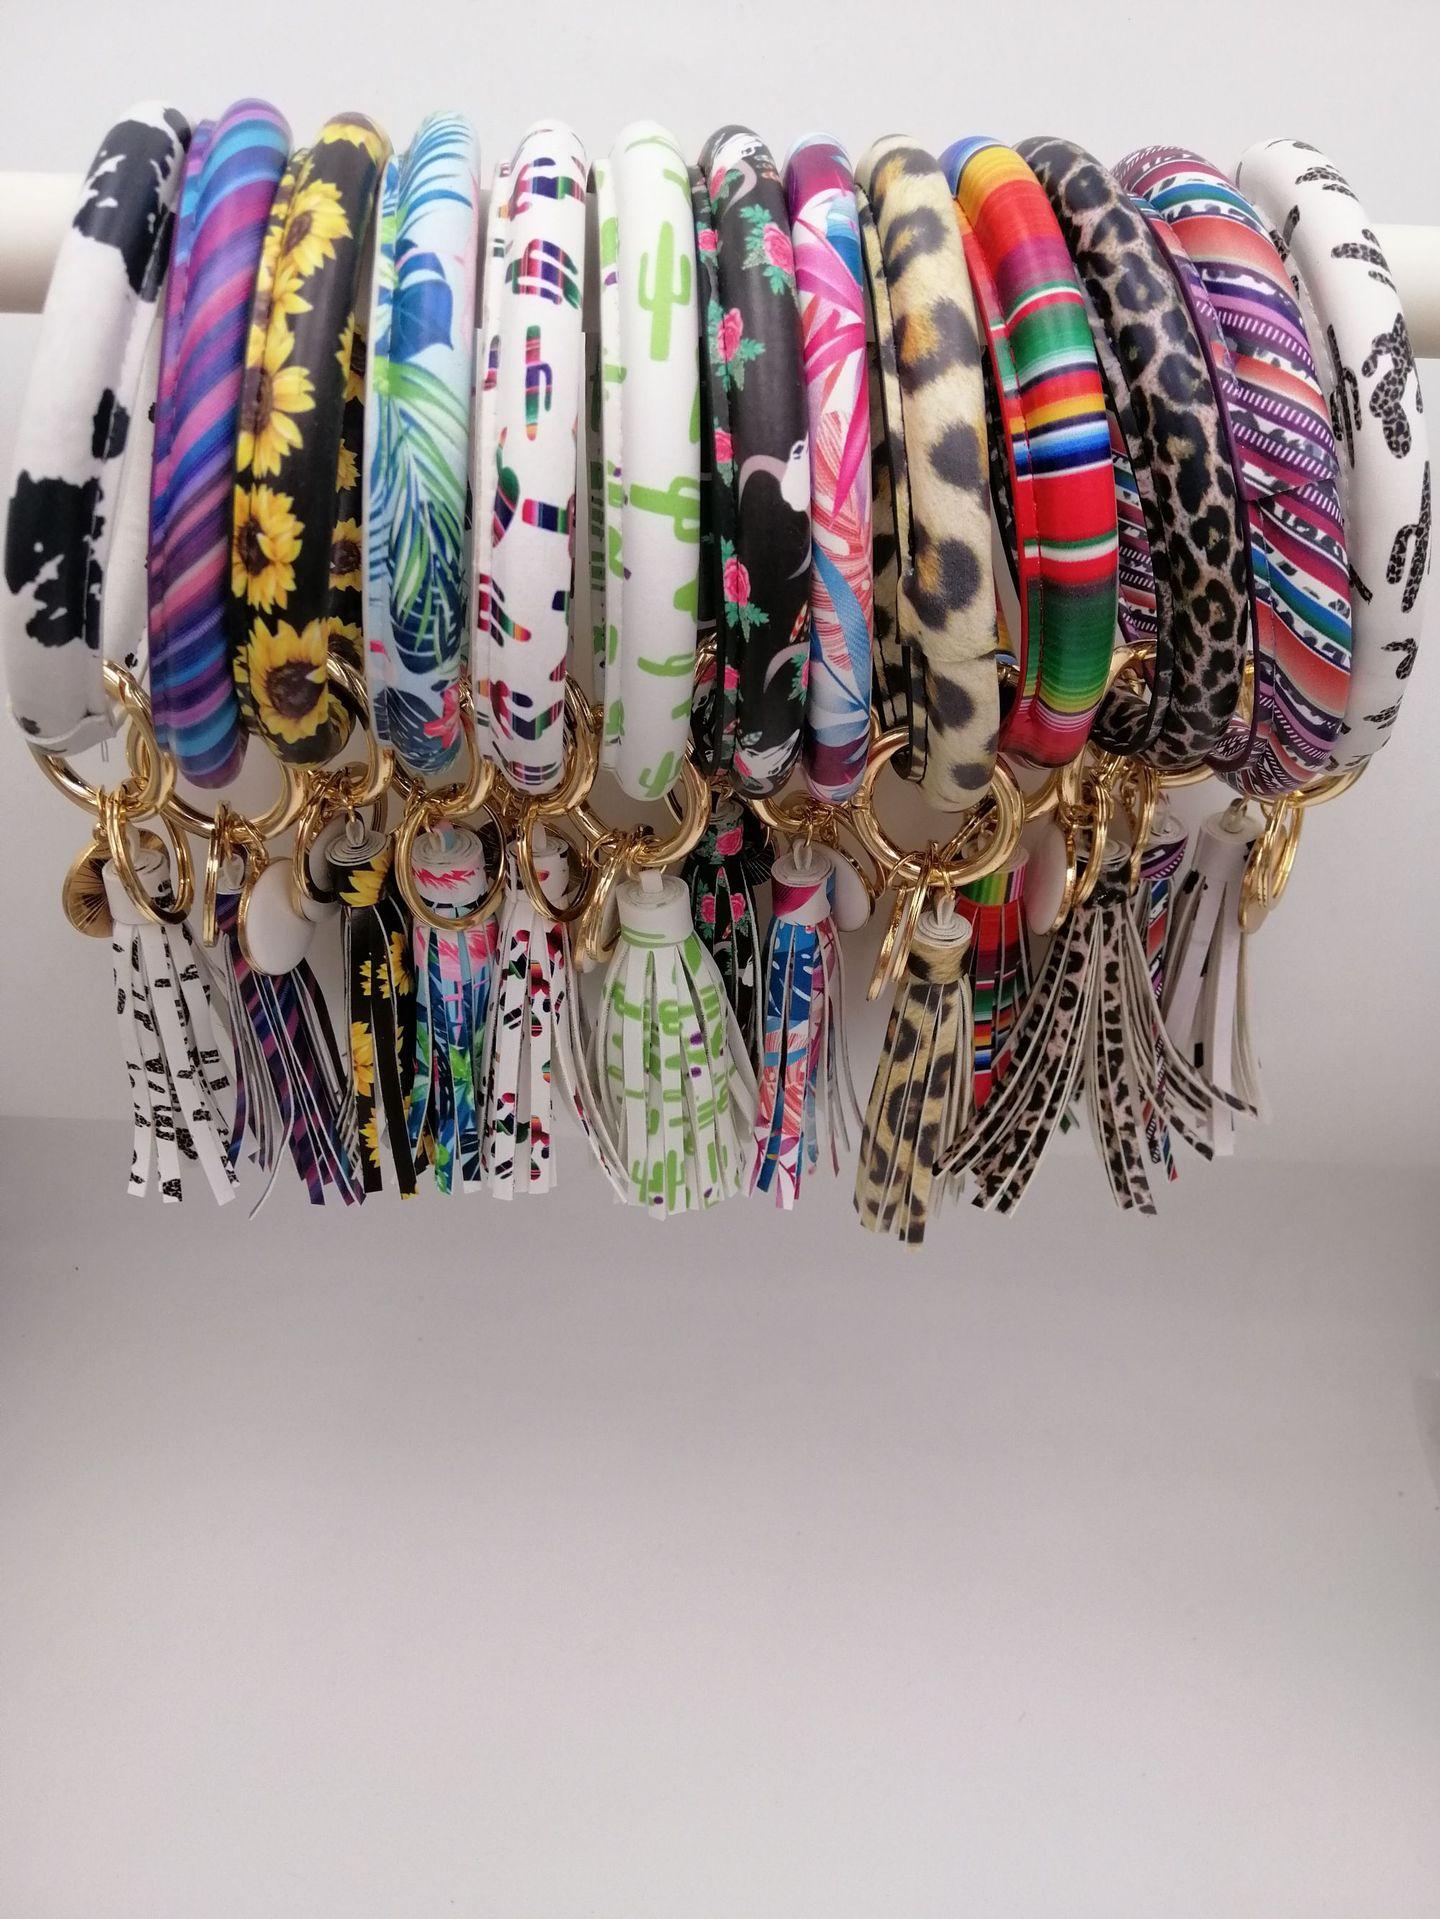 32colors Pu Leather Bracelet Round Drop Oil Tassel Pendant Bracelet&Bangle Keychain  For Women Girl Wrist Strap